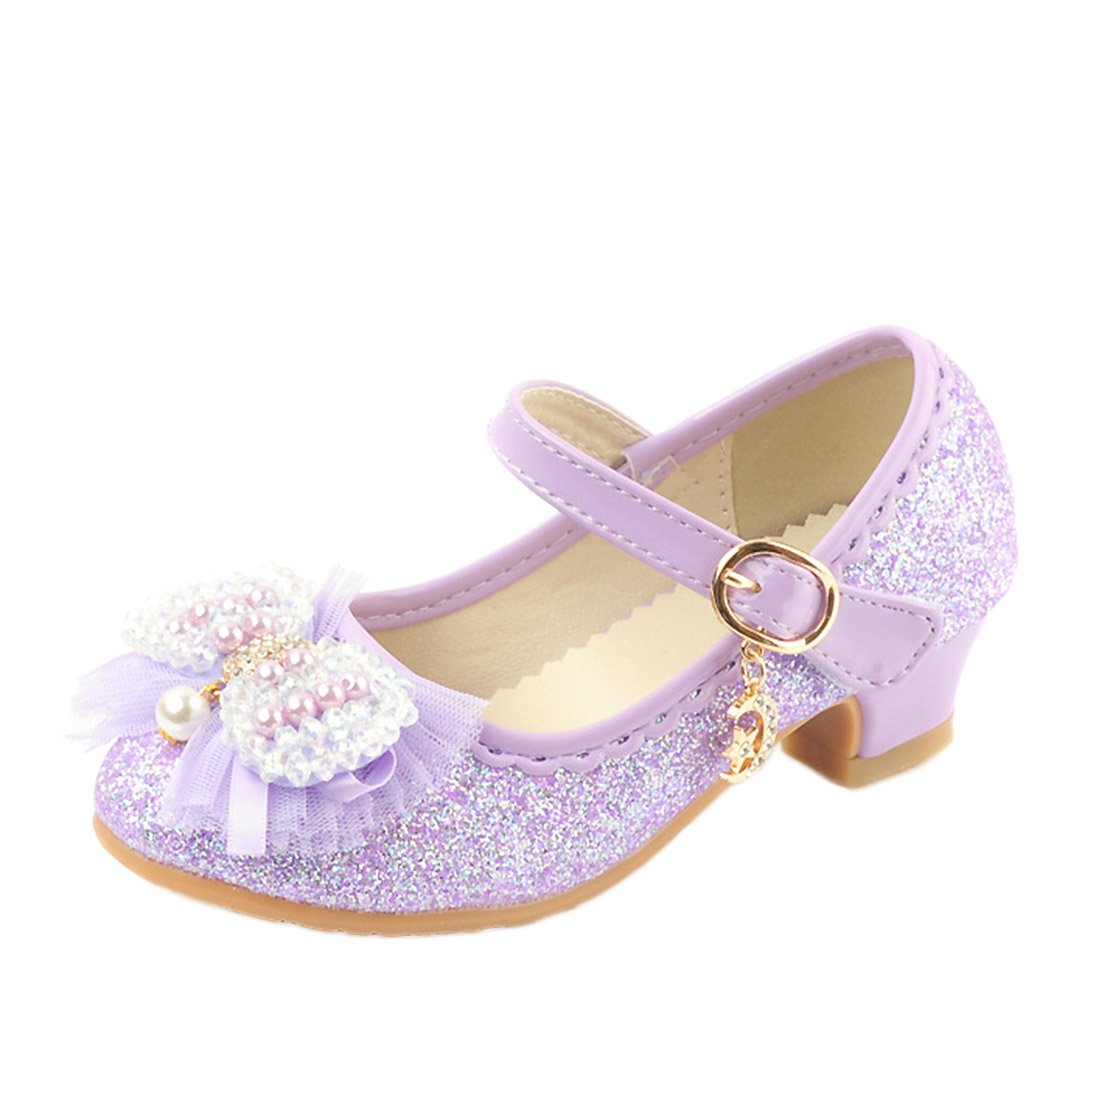 O&N Girls Kids Children Glitter Party Wedding Mary Jane Low Heels School Dress Shoes